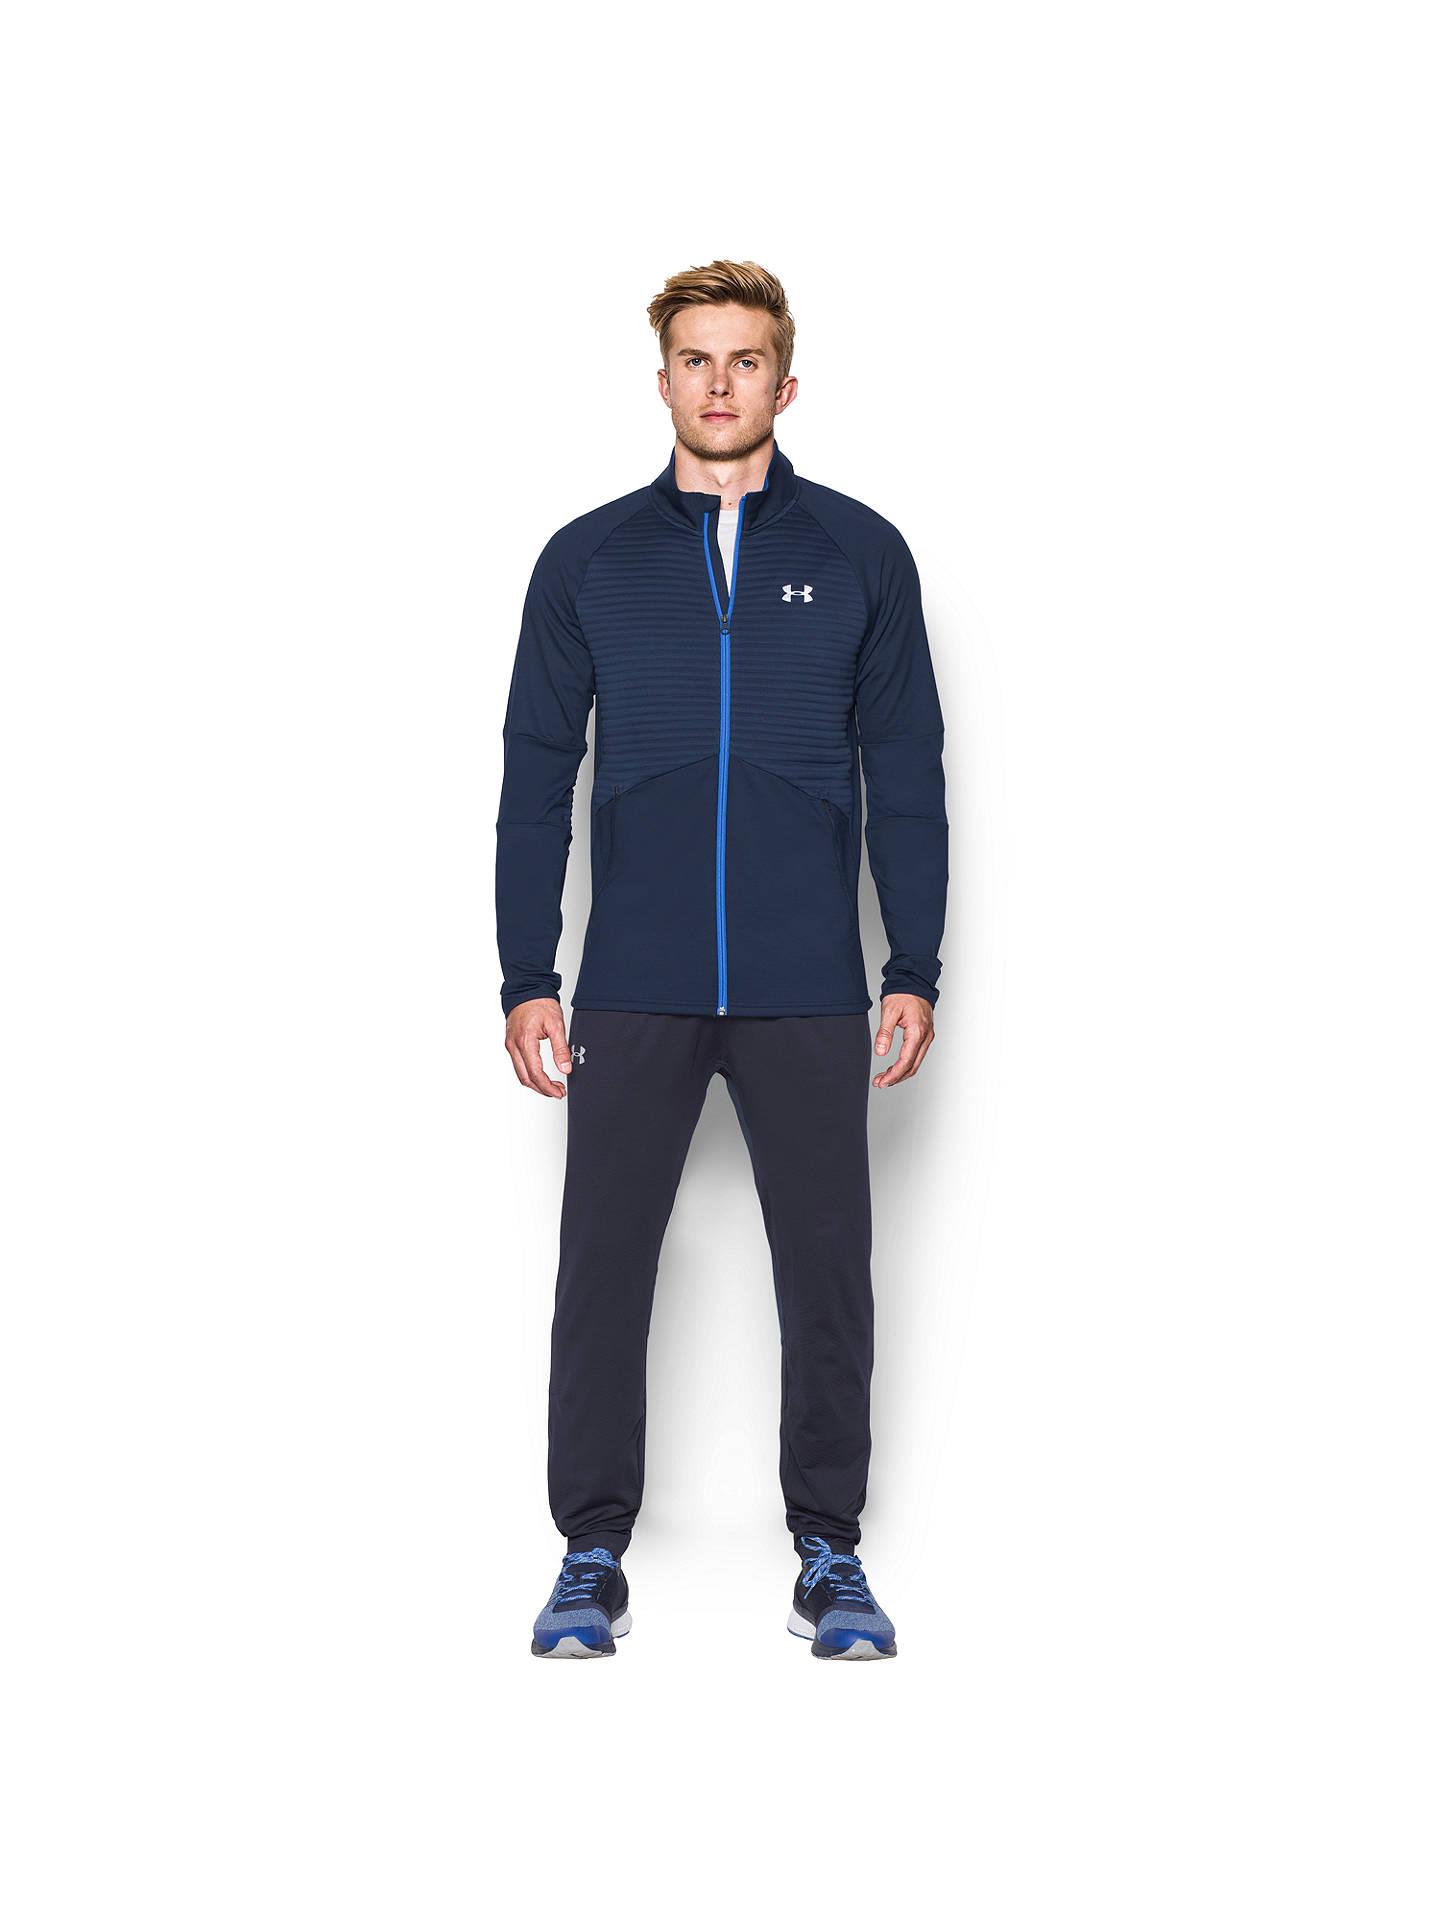 33471b472f ... Buy Under Armour NoBreaks ColdGear Infrared Men's Running Jacket, Blue,  S Online at johnlewis ...